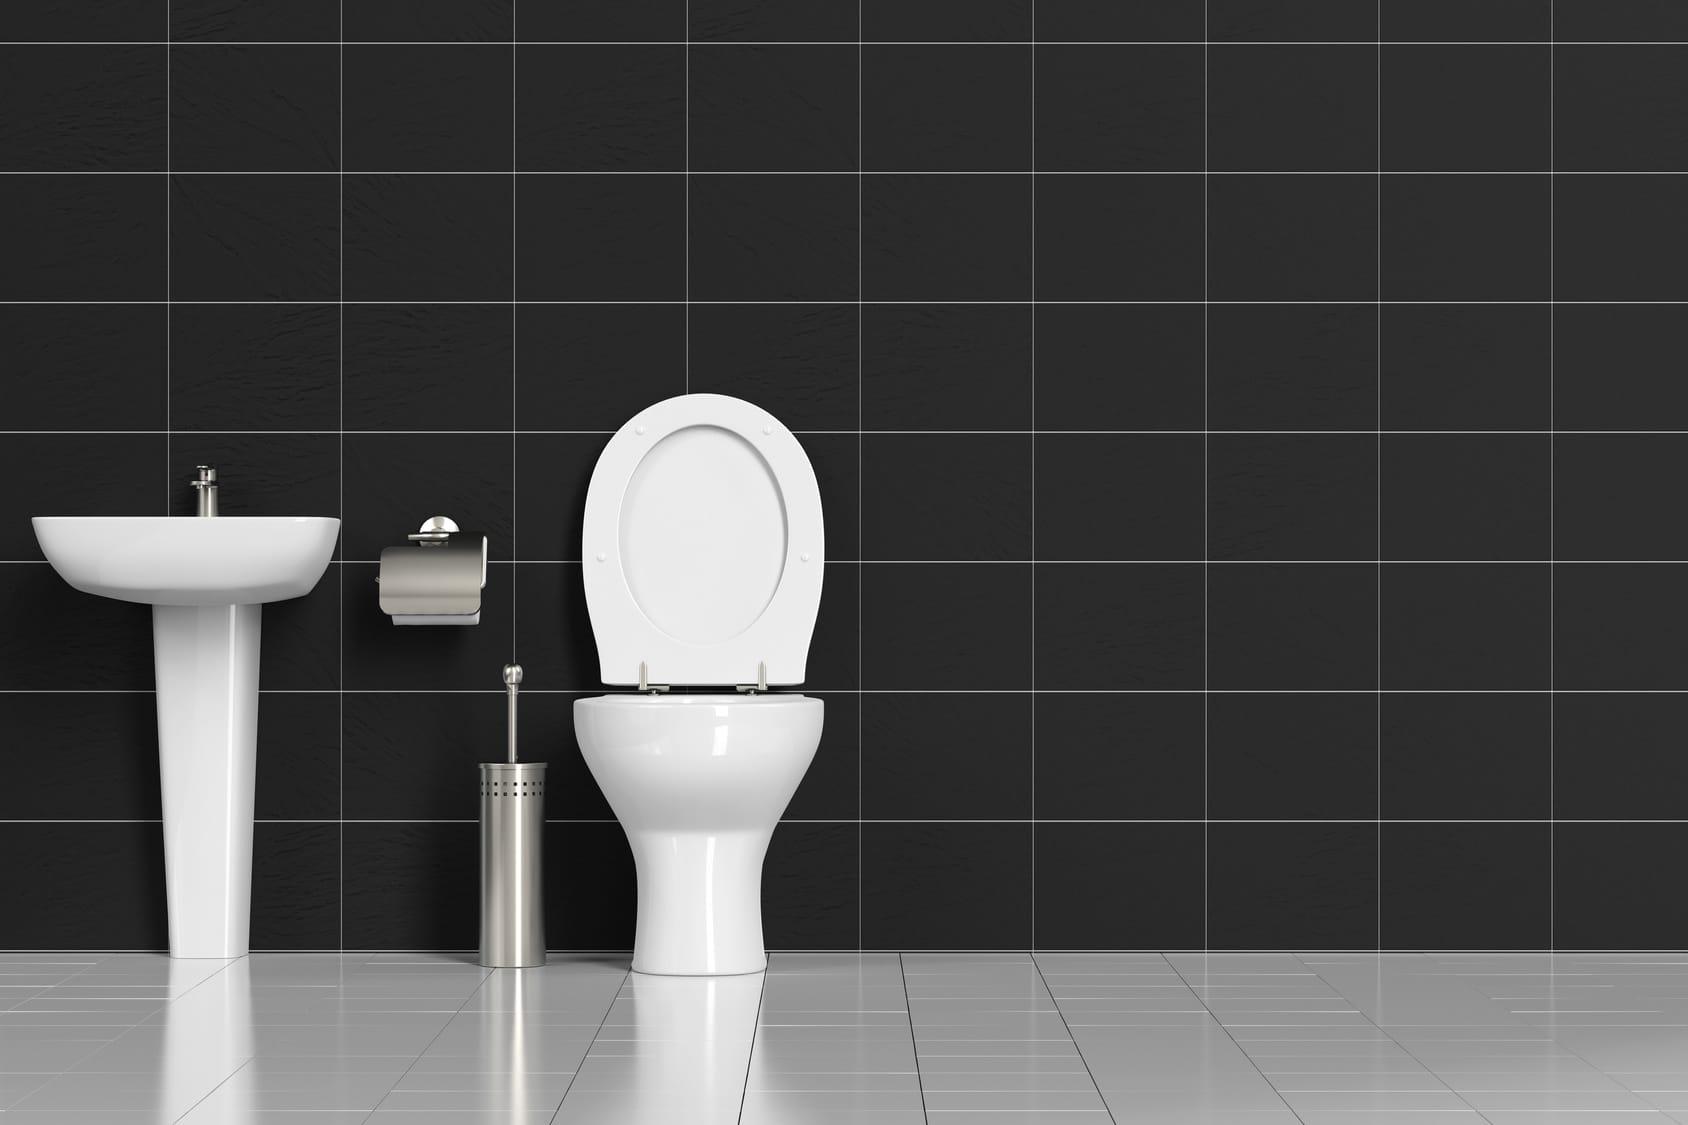 toilette reinigen 10 tipps tricks. Black Bedroom Furniture Sets. Home Design Ideas